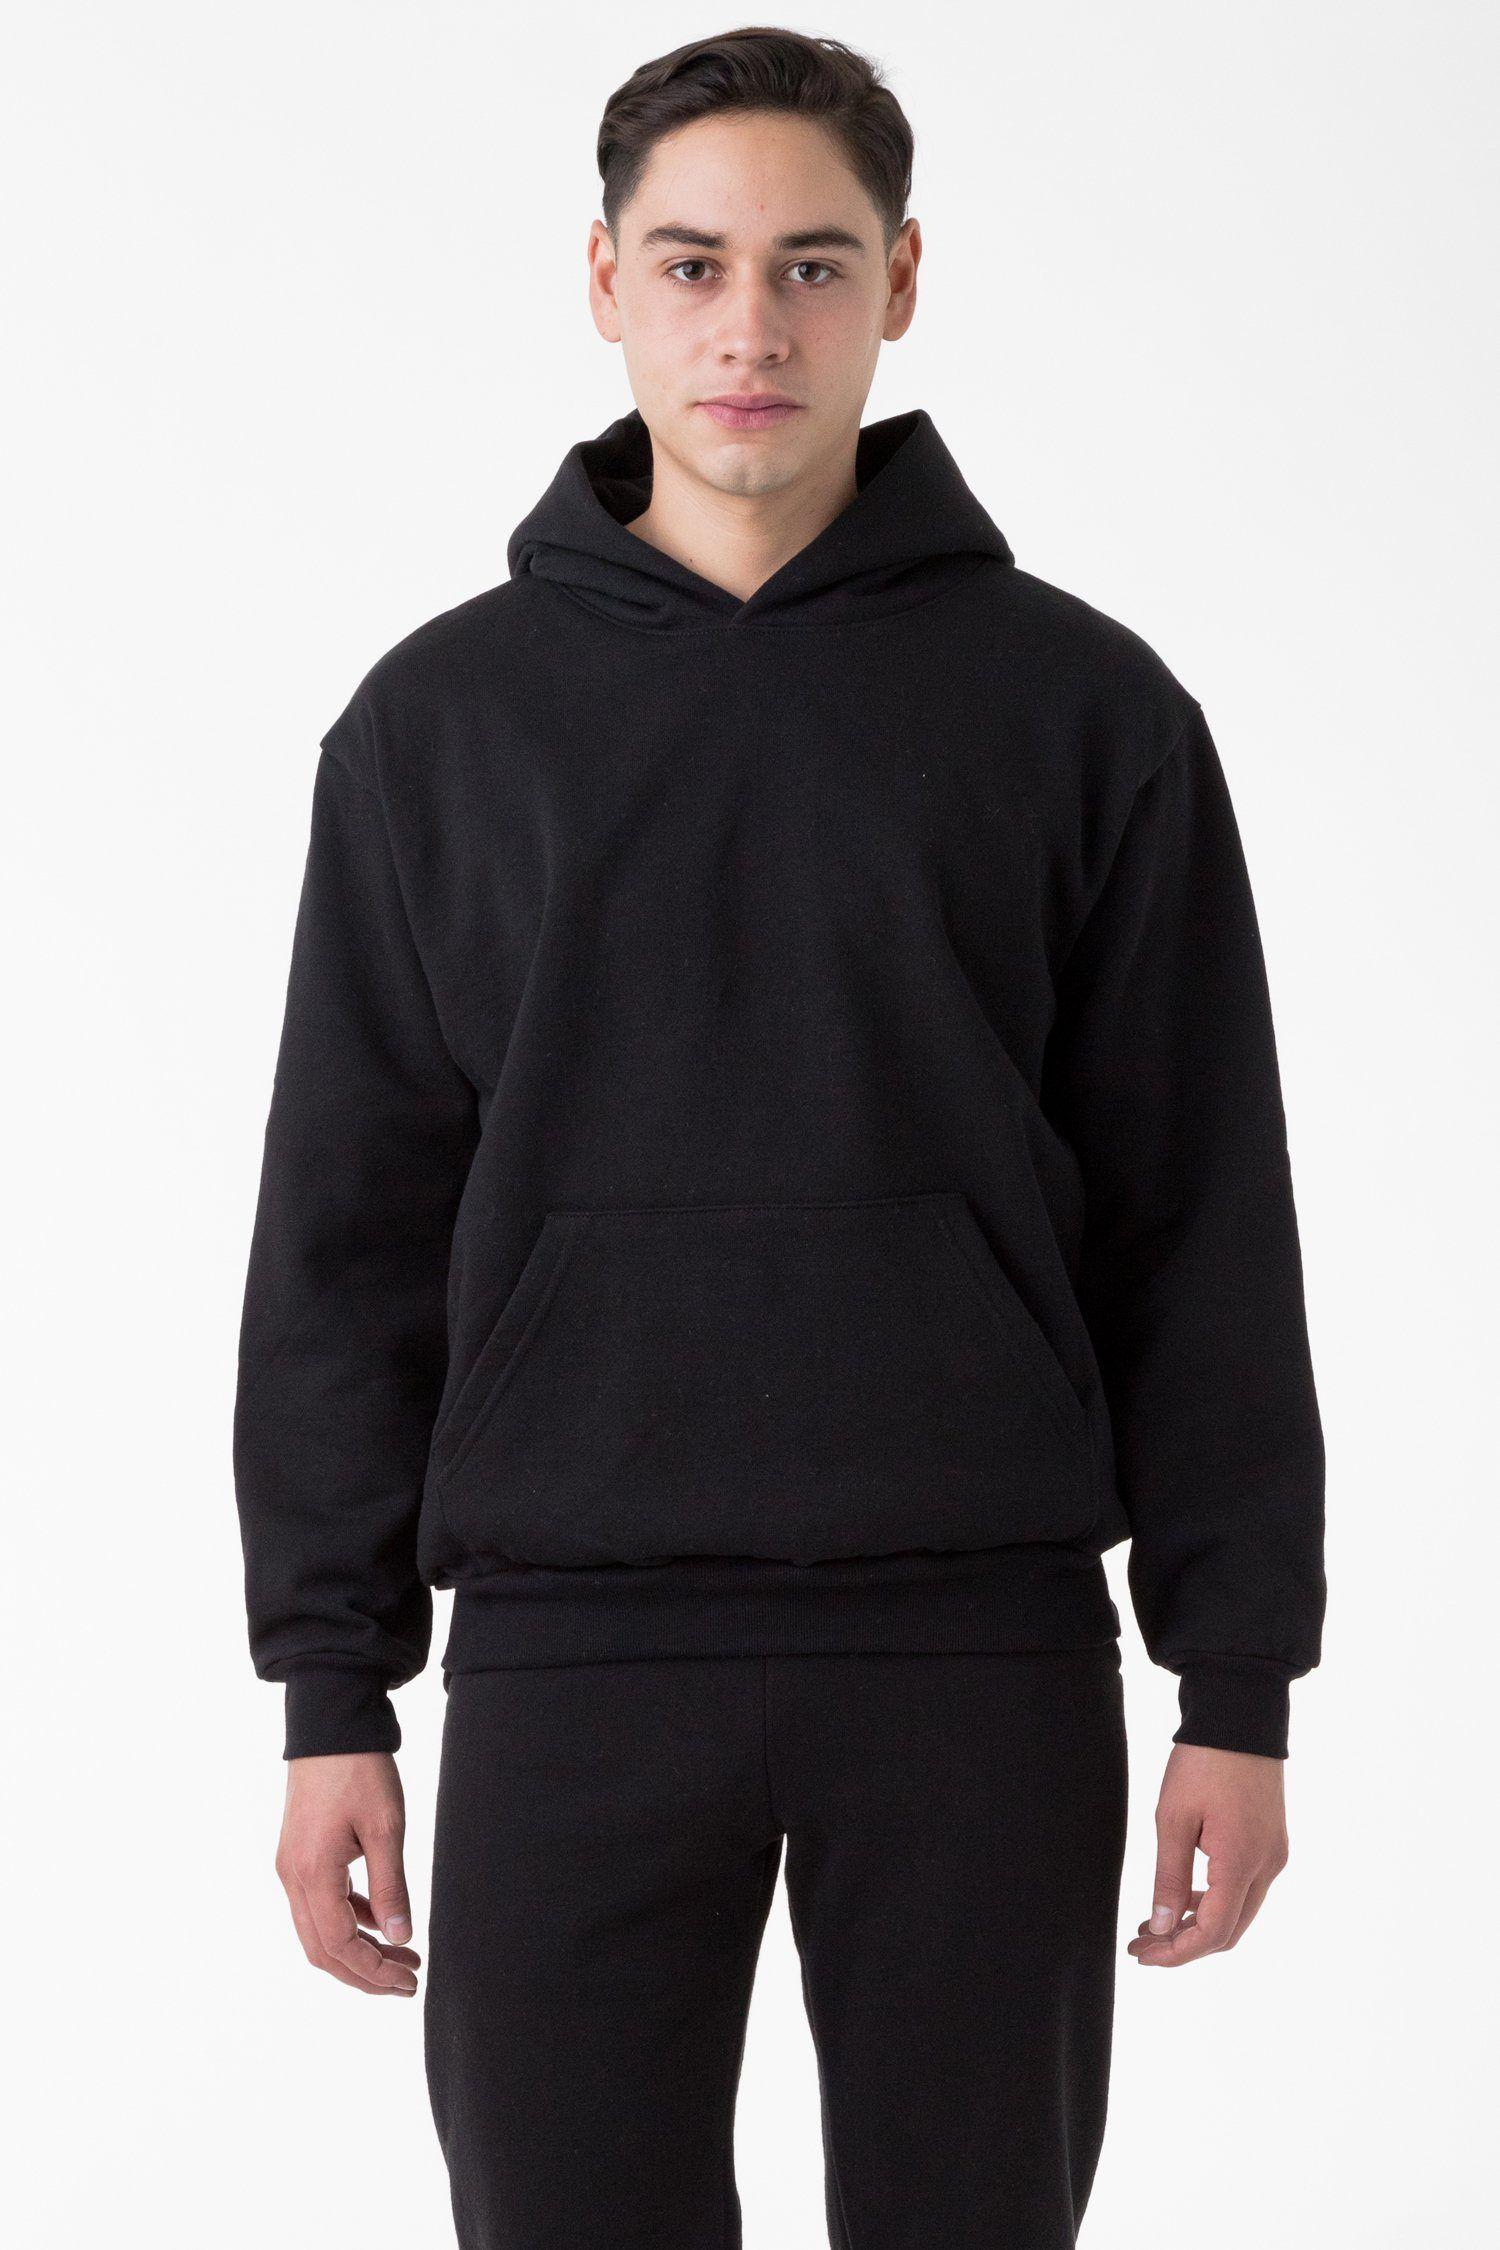 Hf 09 14oz Heavy Fleece Hooded Pullover Sweatshirt Hooded Pullover Pullover Sweatshirt Black Sweatshirts